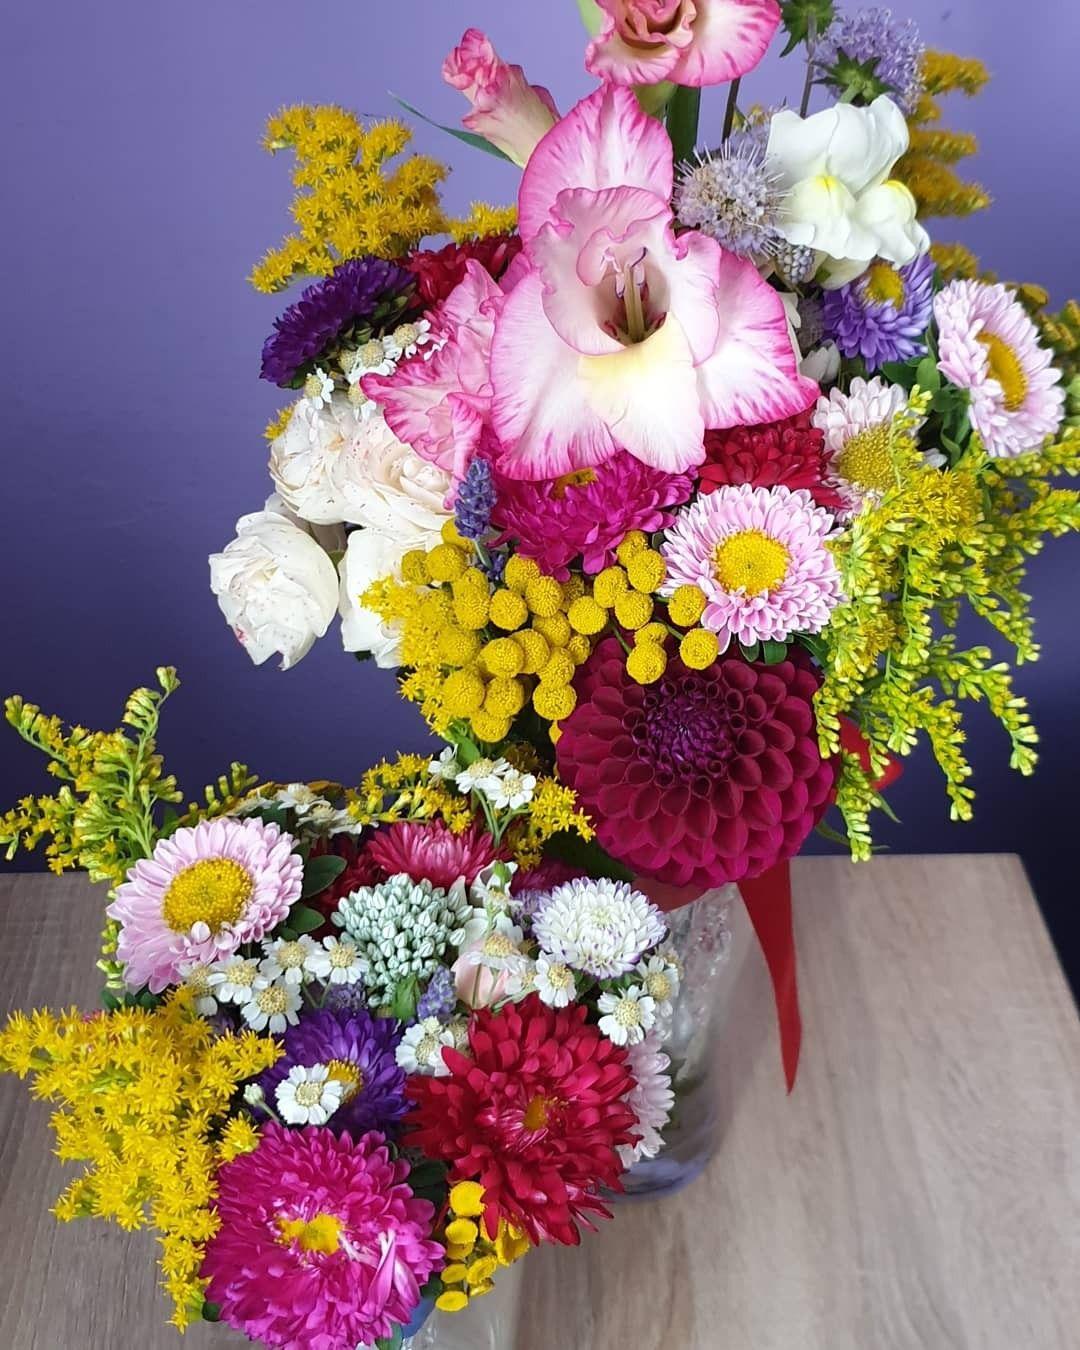 Bukiety Kwiatow Floral Wreath Floral Decor